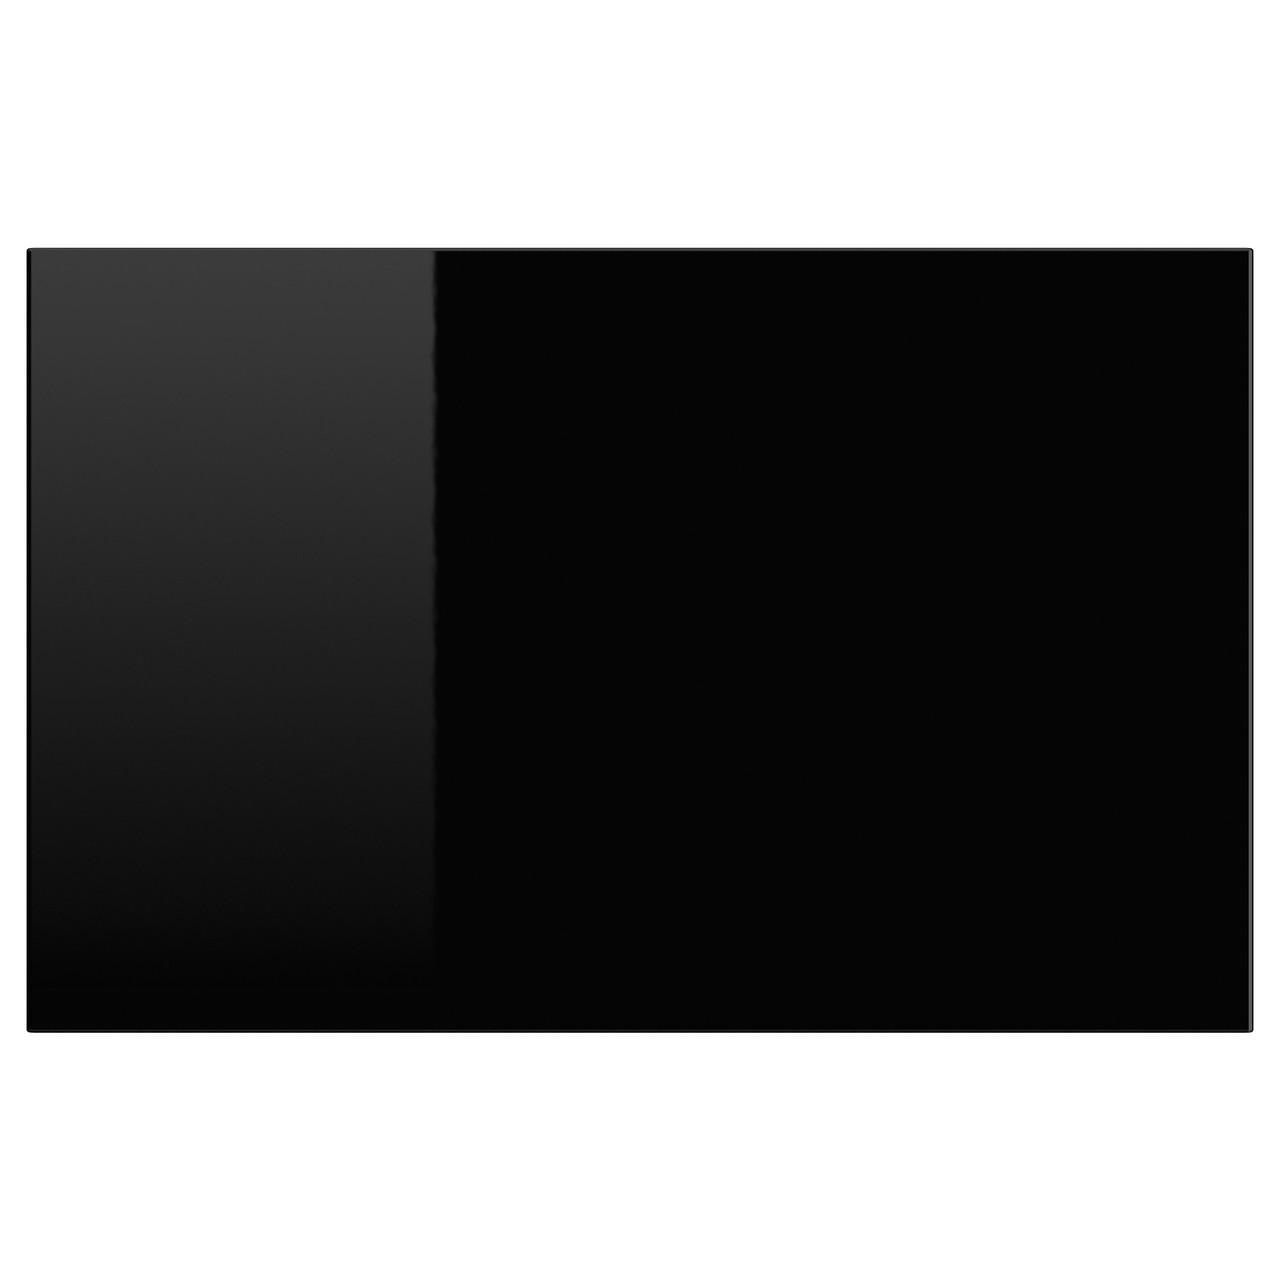 SELSVIKEN Drzwi/front szuflady, połysk czarny 502.916.24